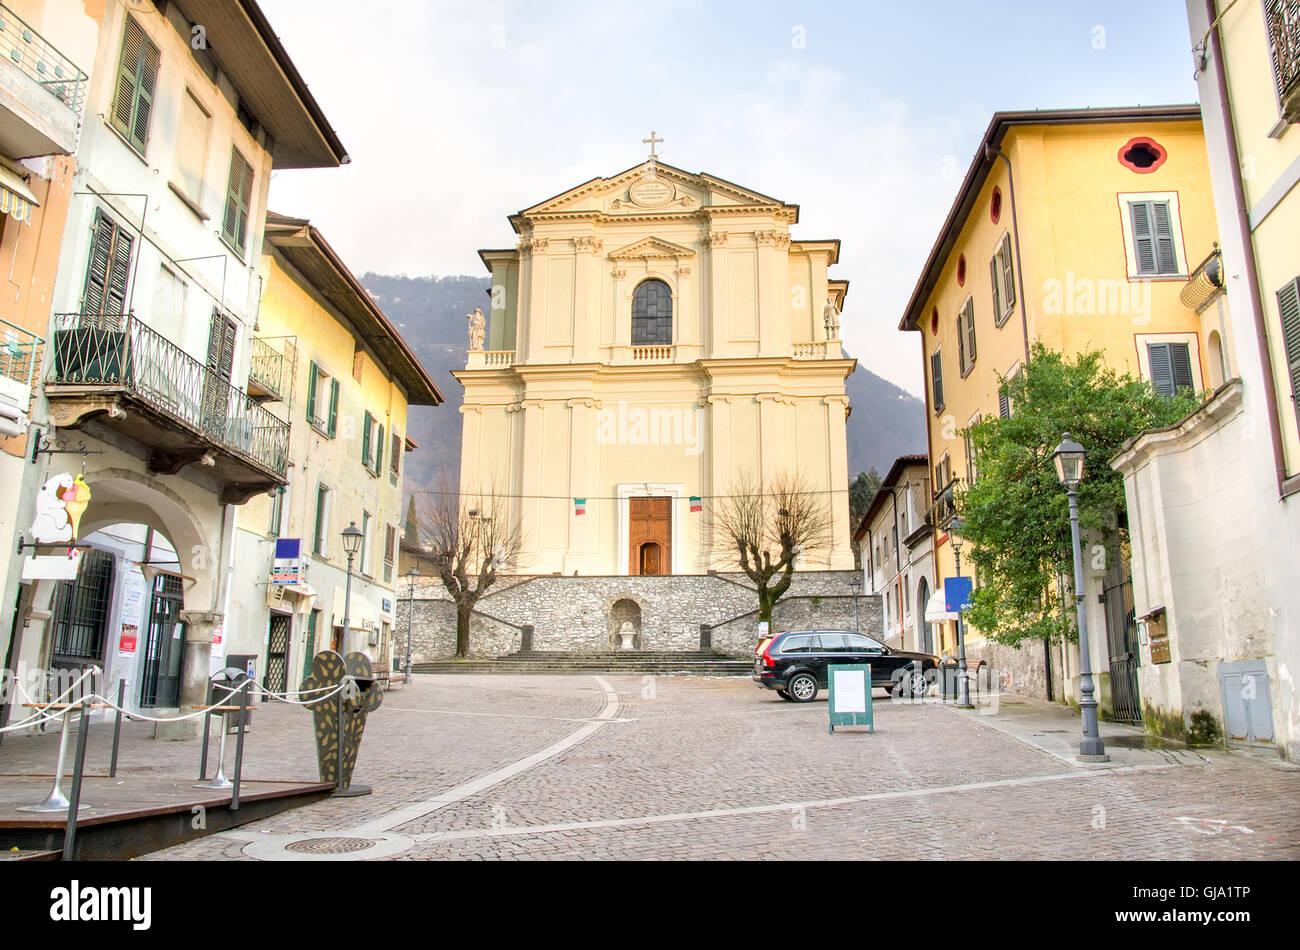 The Santa Maria church facade in the historic center of Pisogne - Stock Image